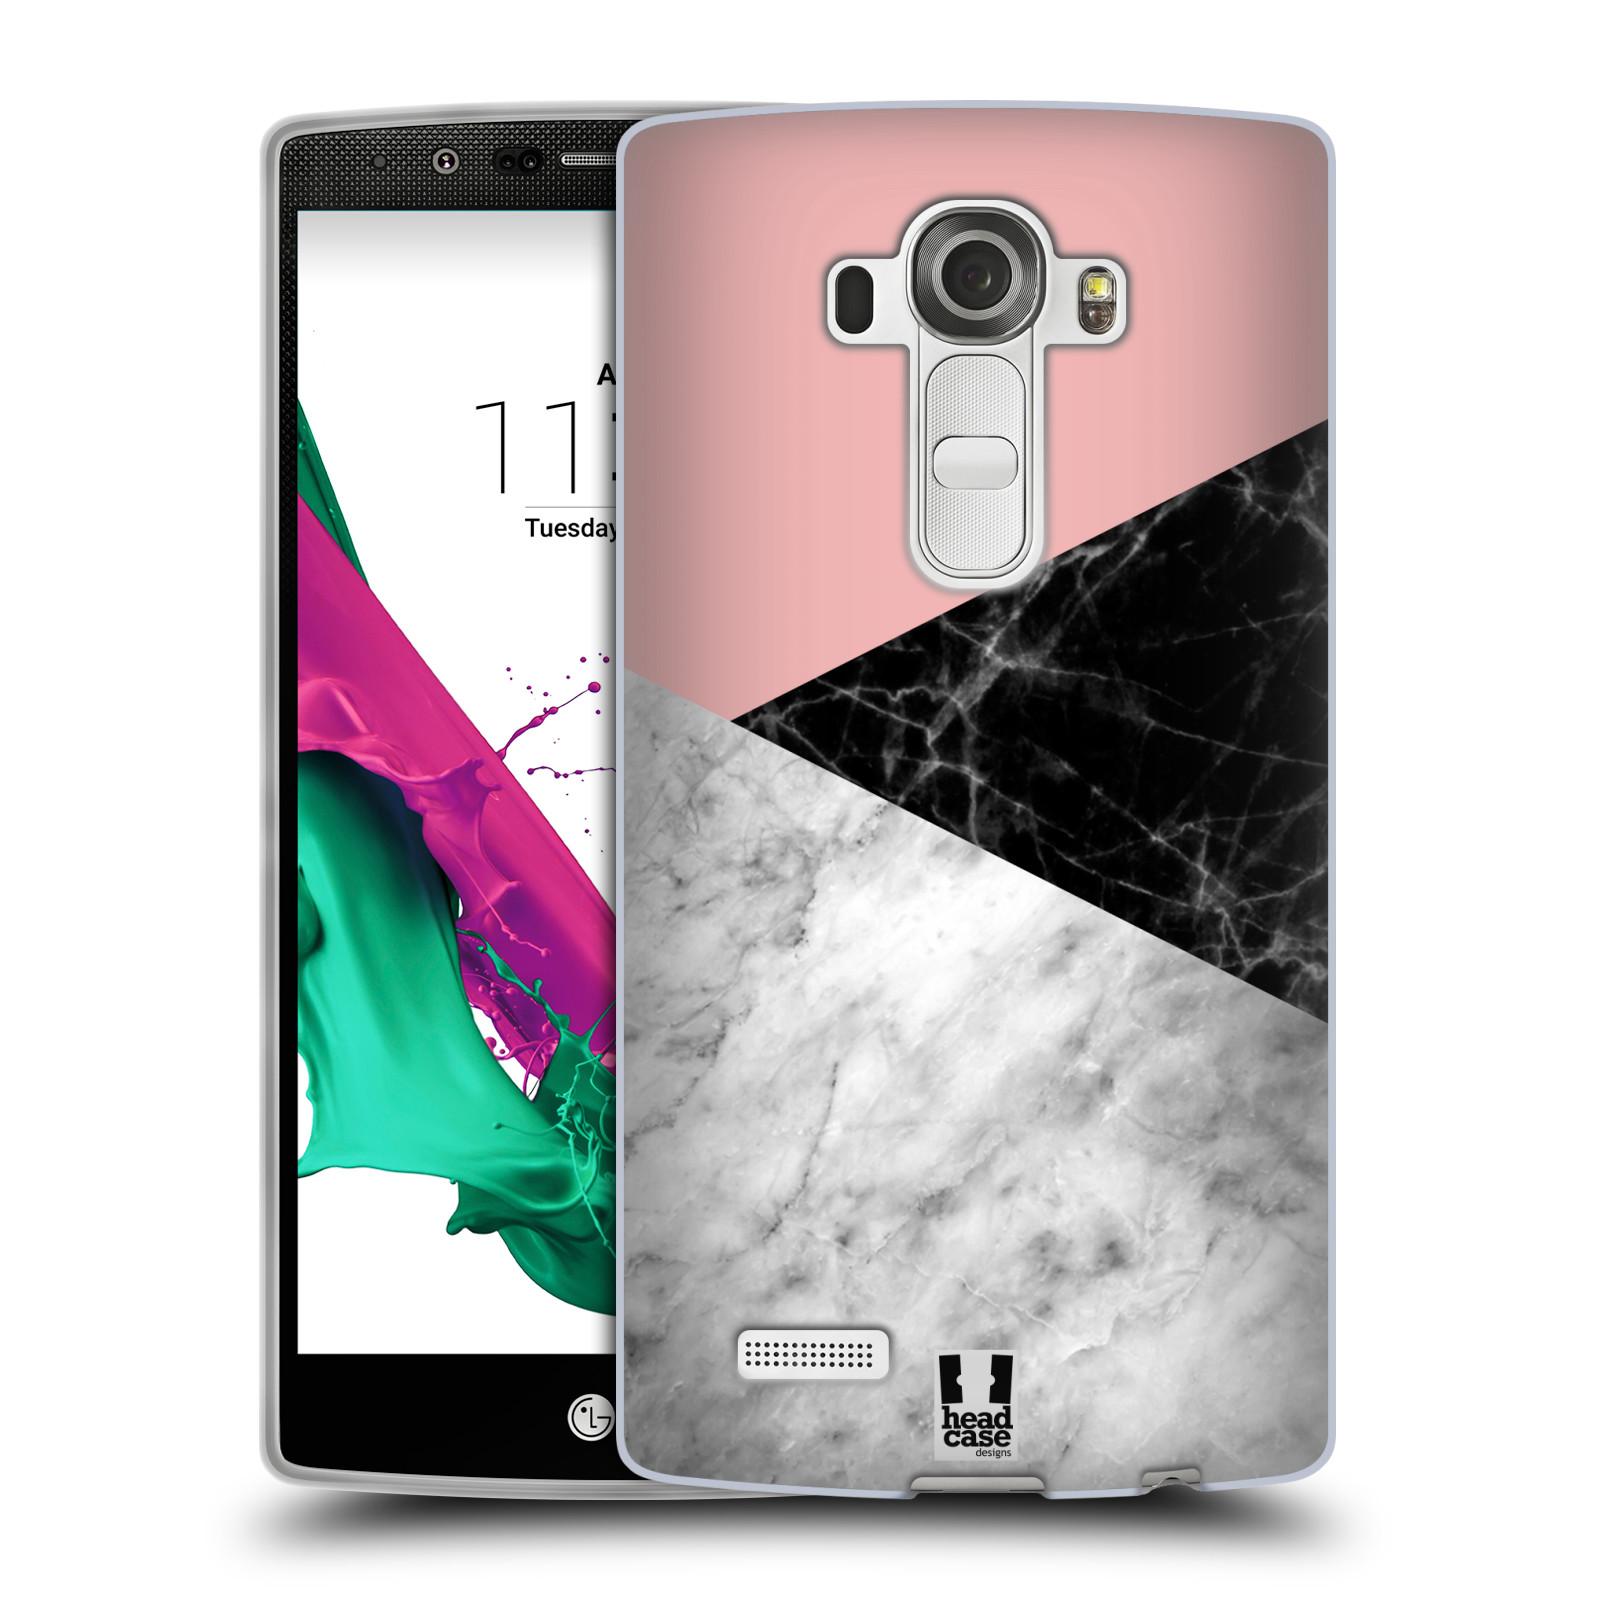 Silikonové pouzdro na mobil LG G4 - Head Case - Mramor mix